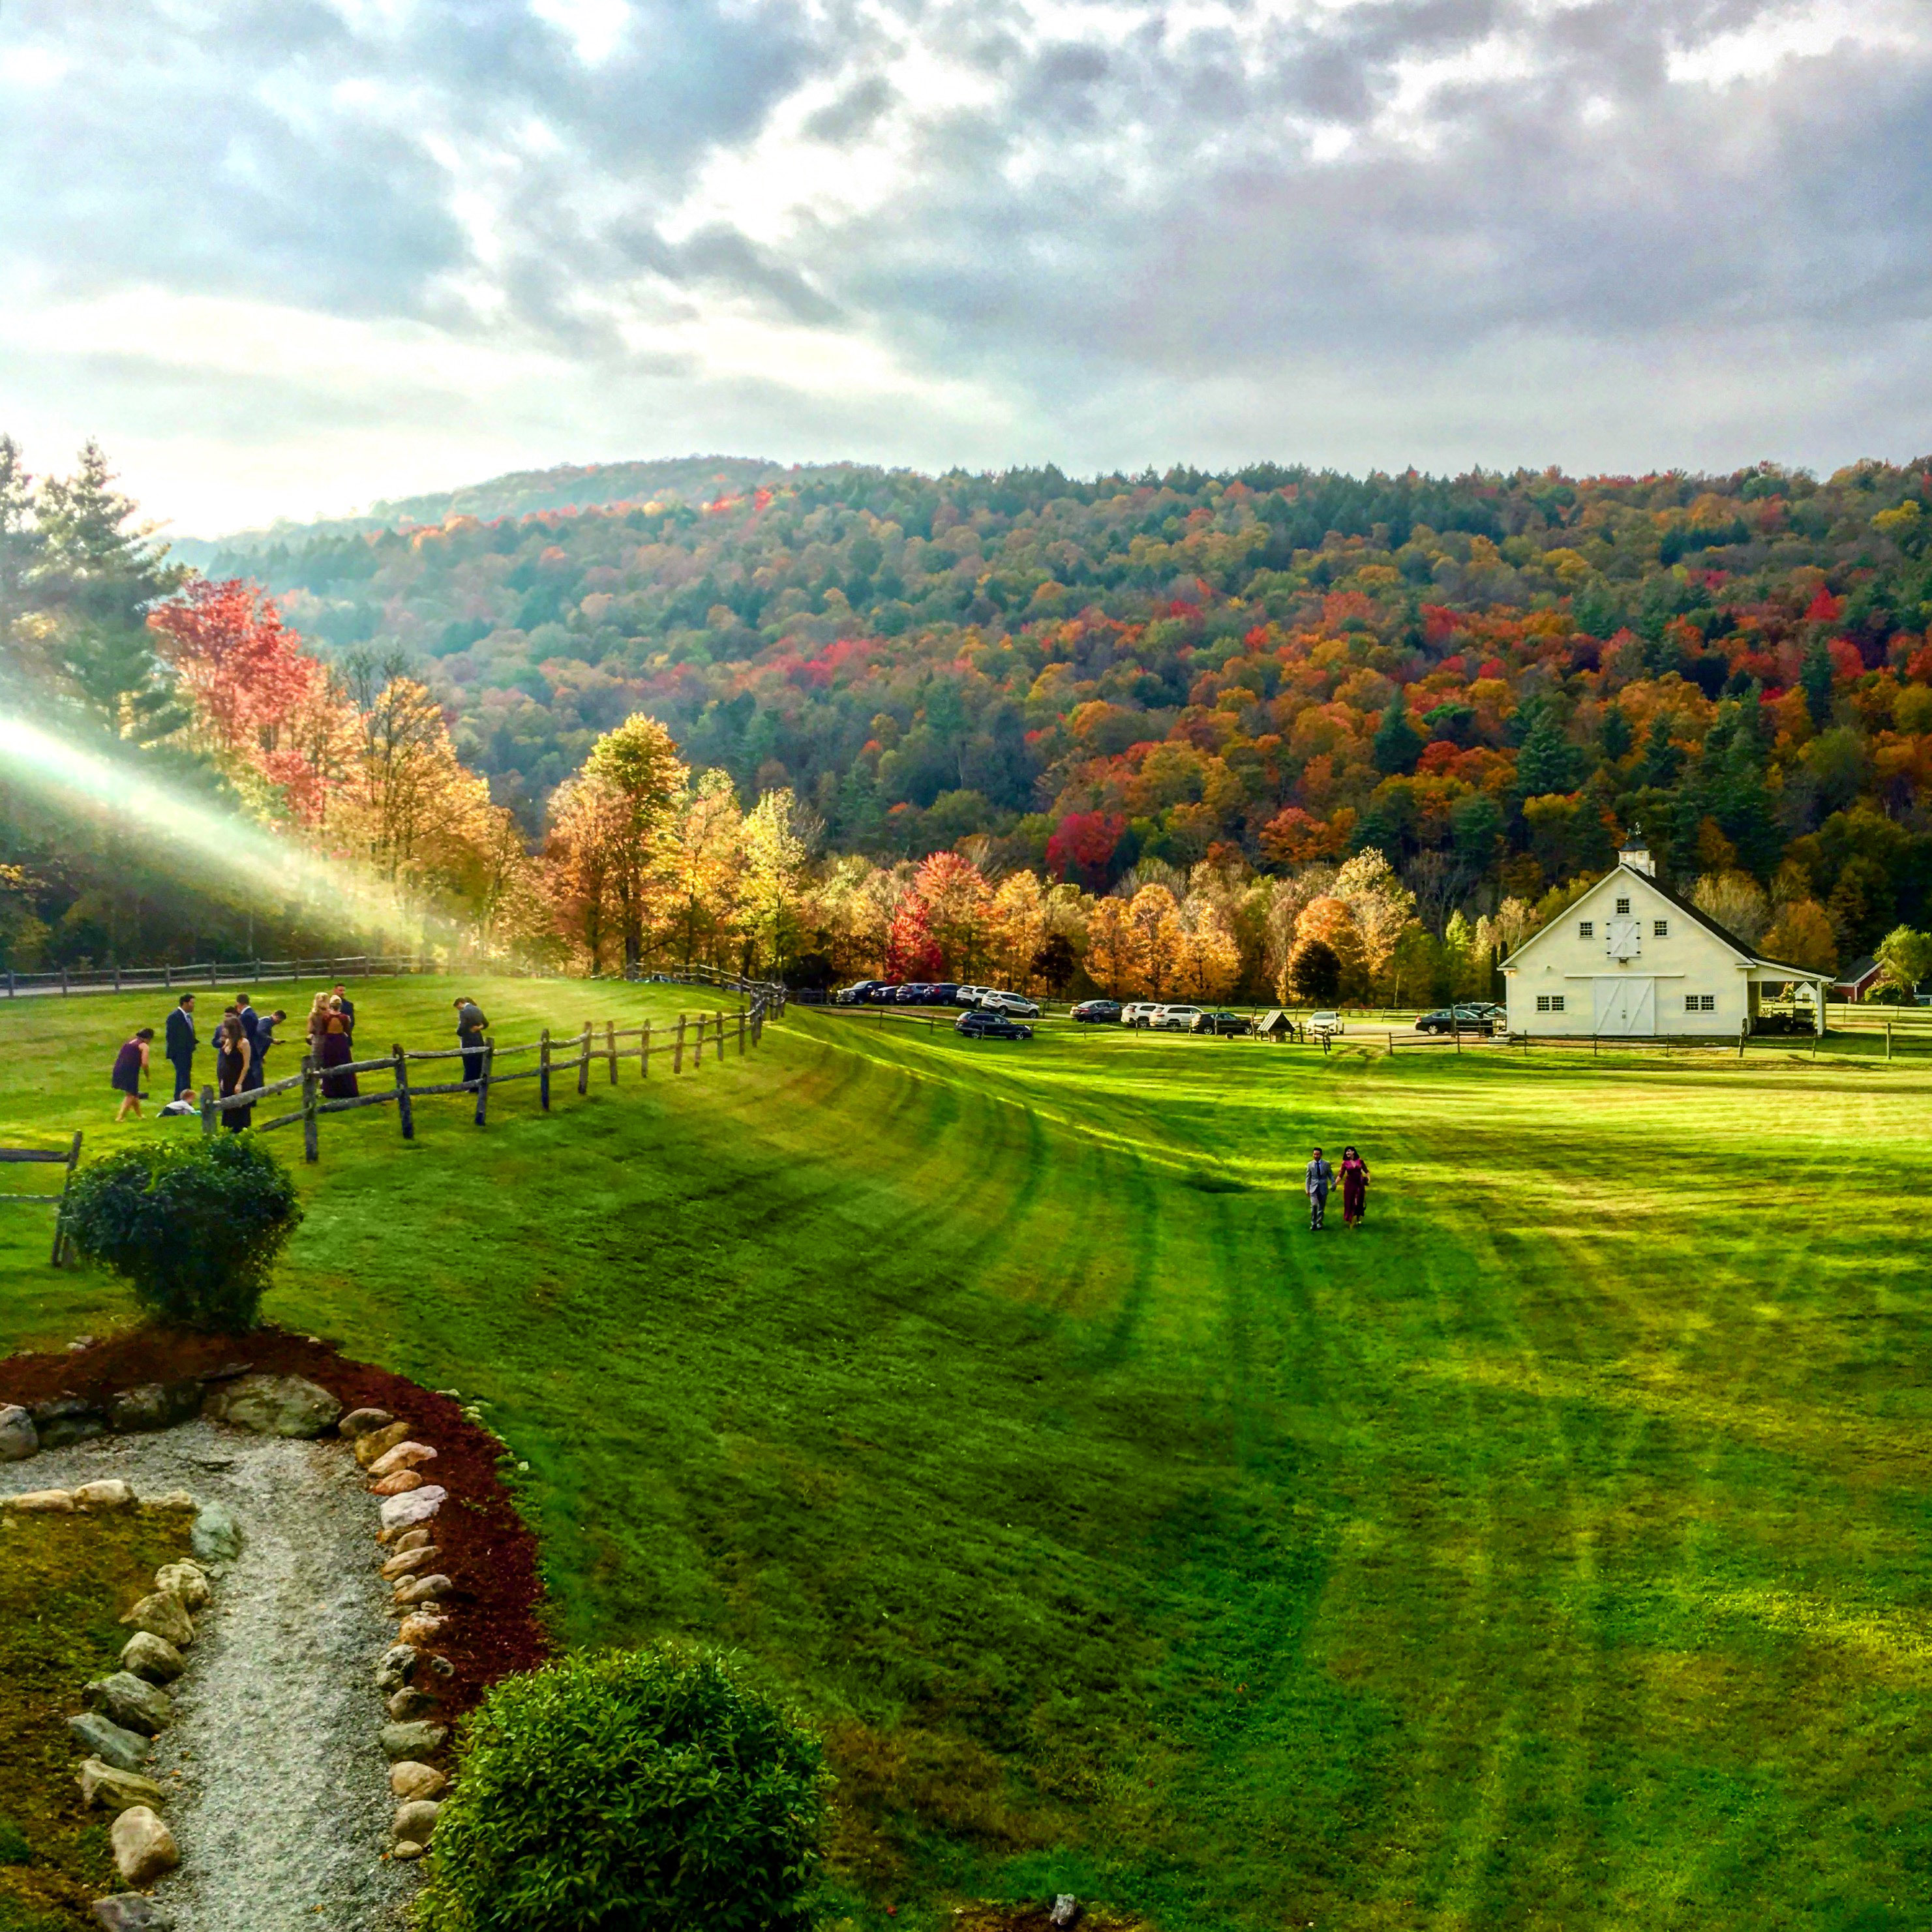 Best fall foliage barn photo